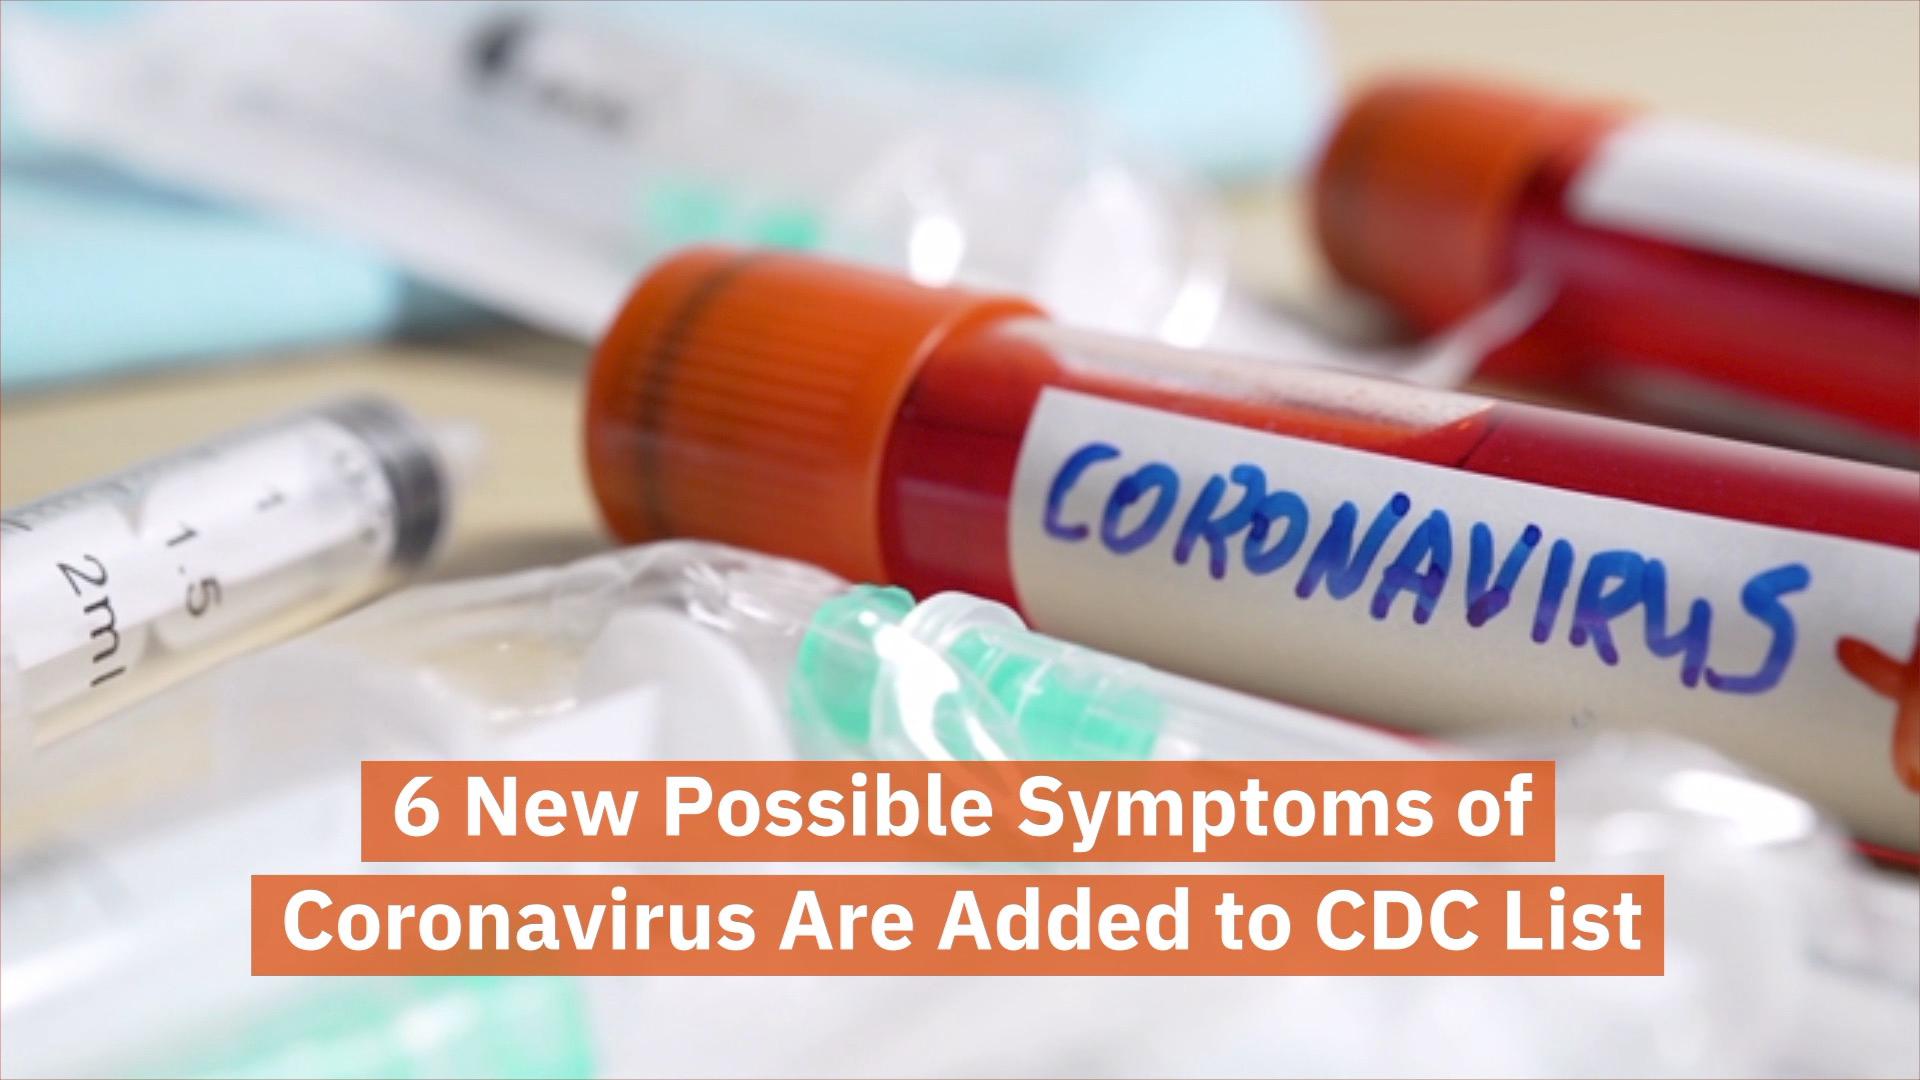 CDC Lists New Covid-19 Symptoms